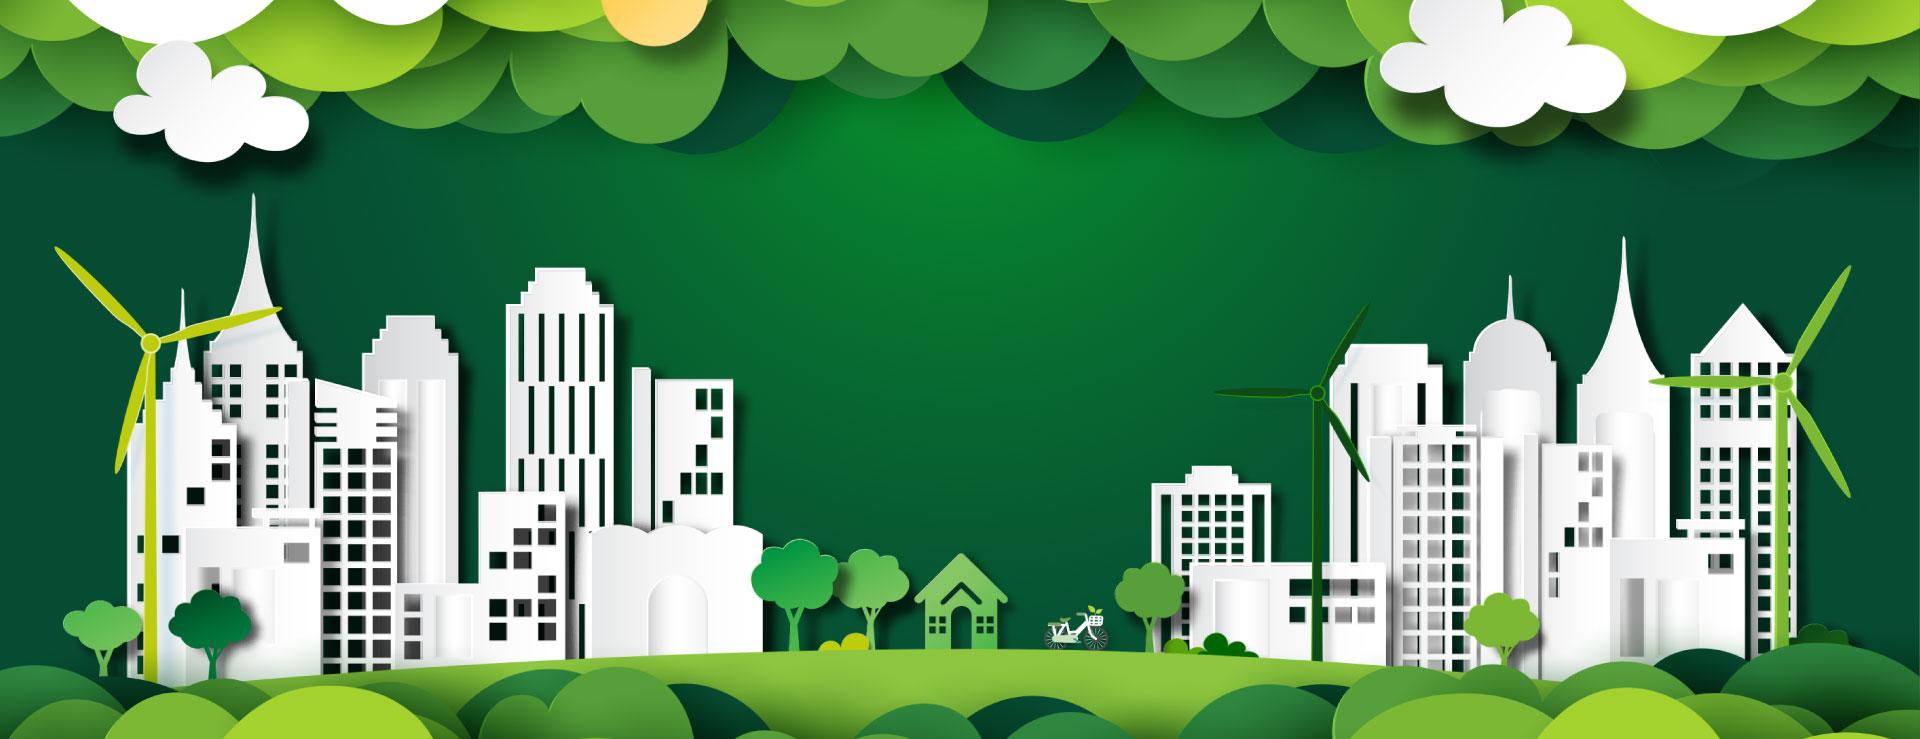 Coromatic sustainibiity